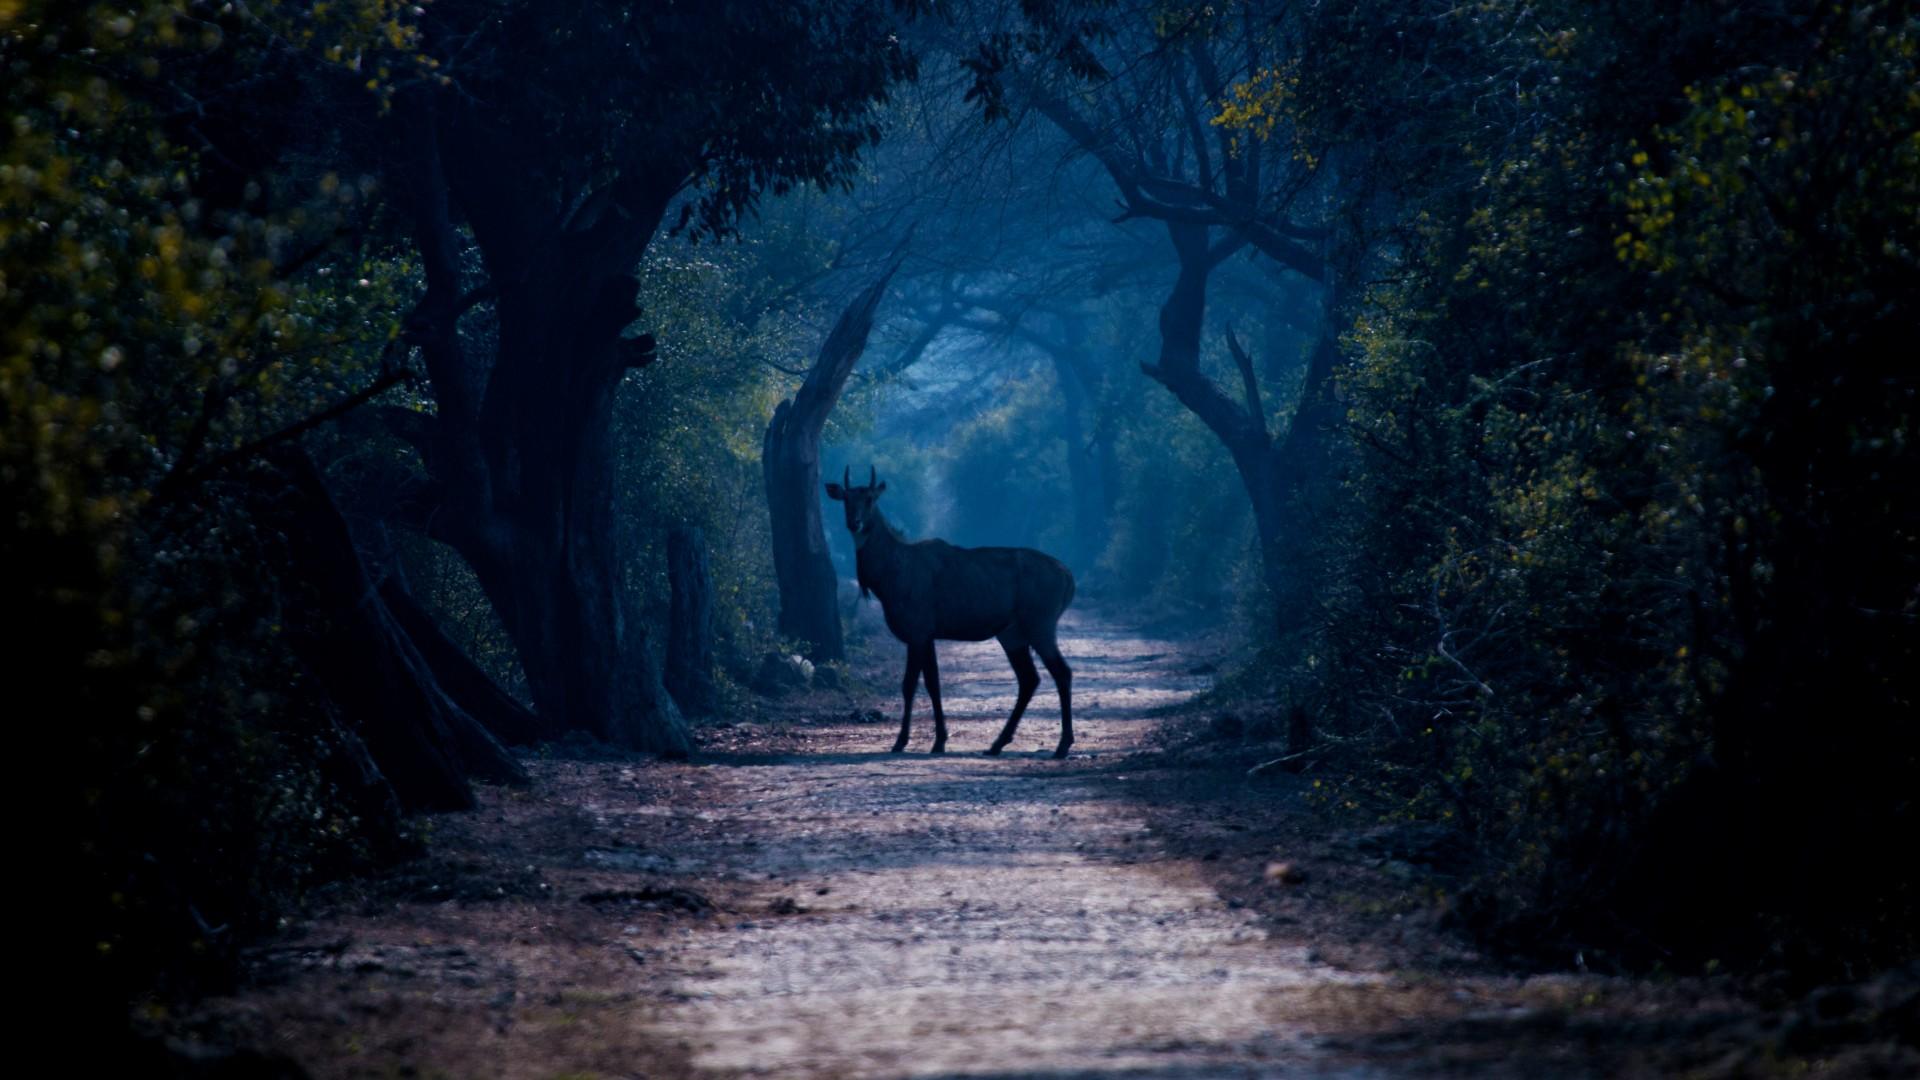 Good Night Hd Wallpaper 3d Love Forest Fog Deer Road Trees Animals Wallpaper